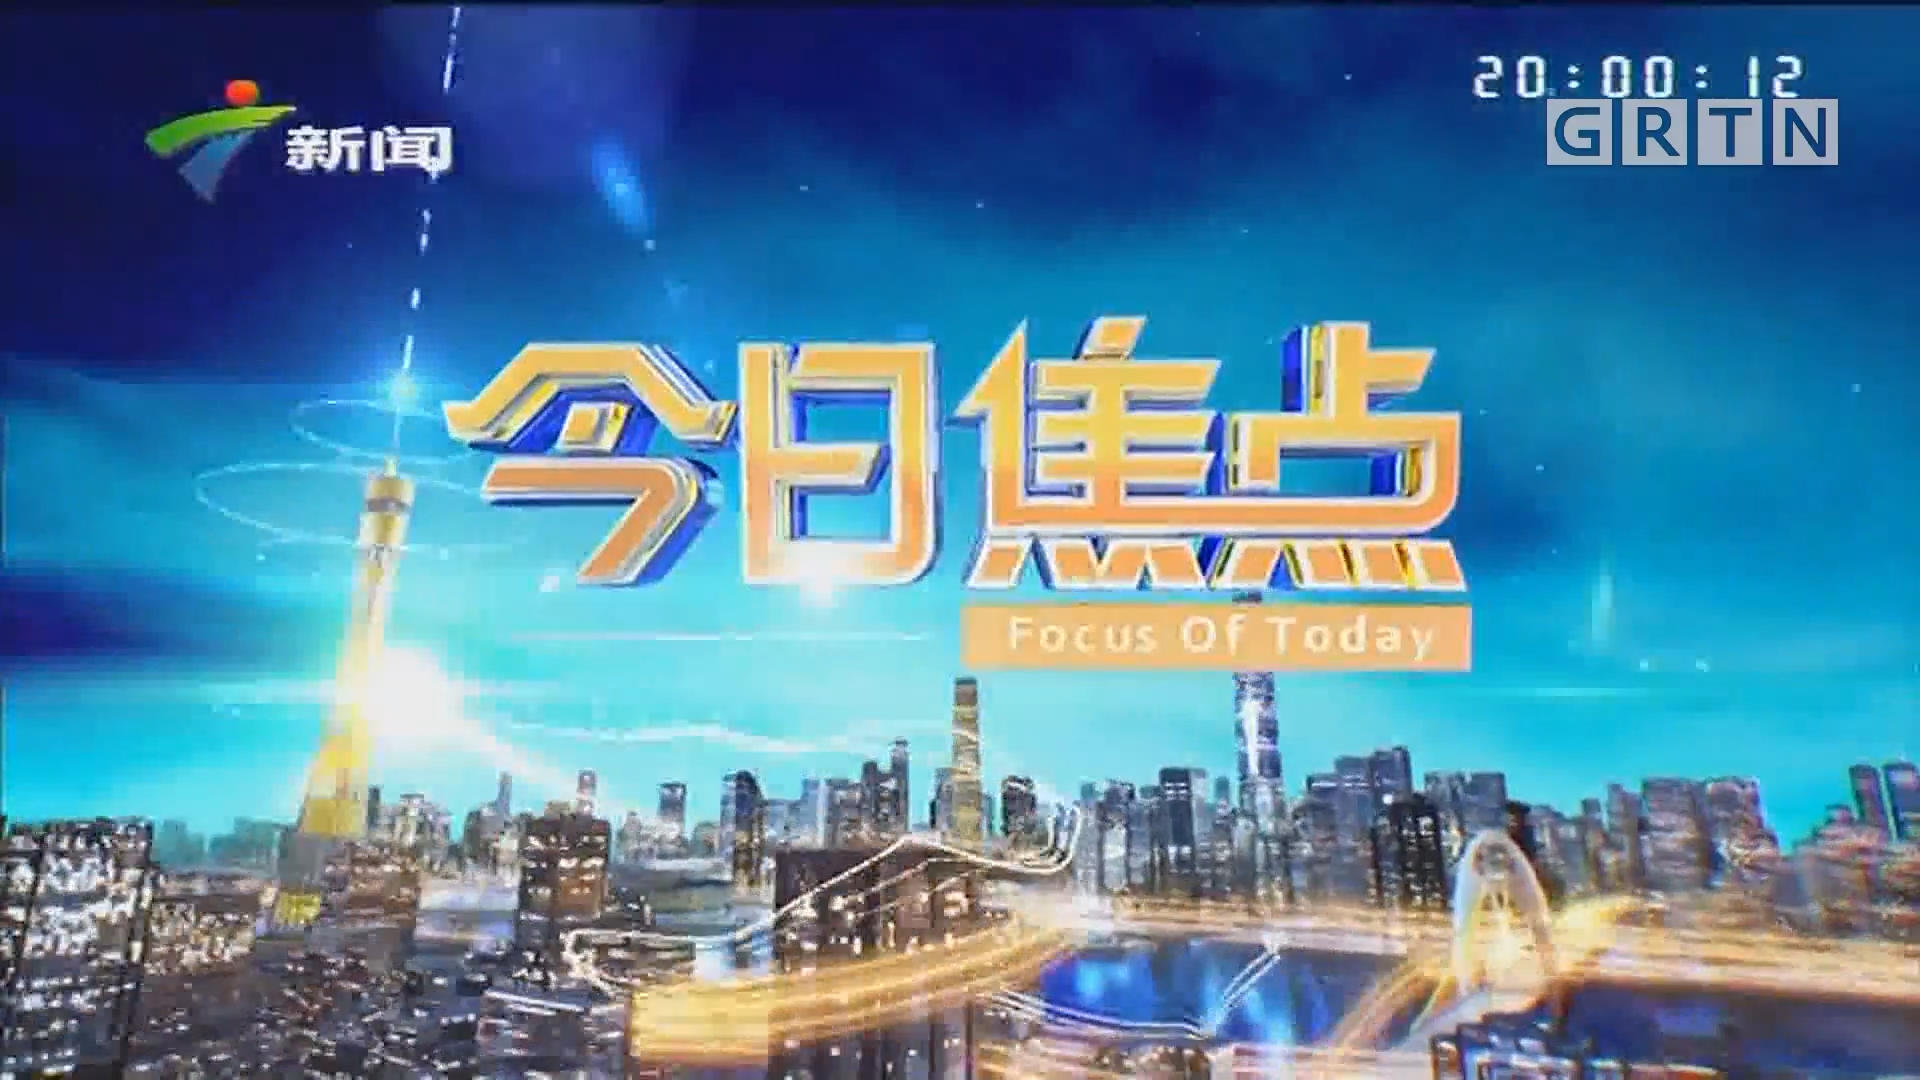 [HD][2019-12-02]今日焦点:广州大道北塌陷事件追踪 早高峰学校周边稍拥挤 但秩序井然